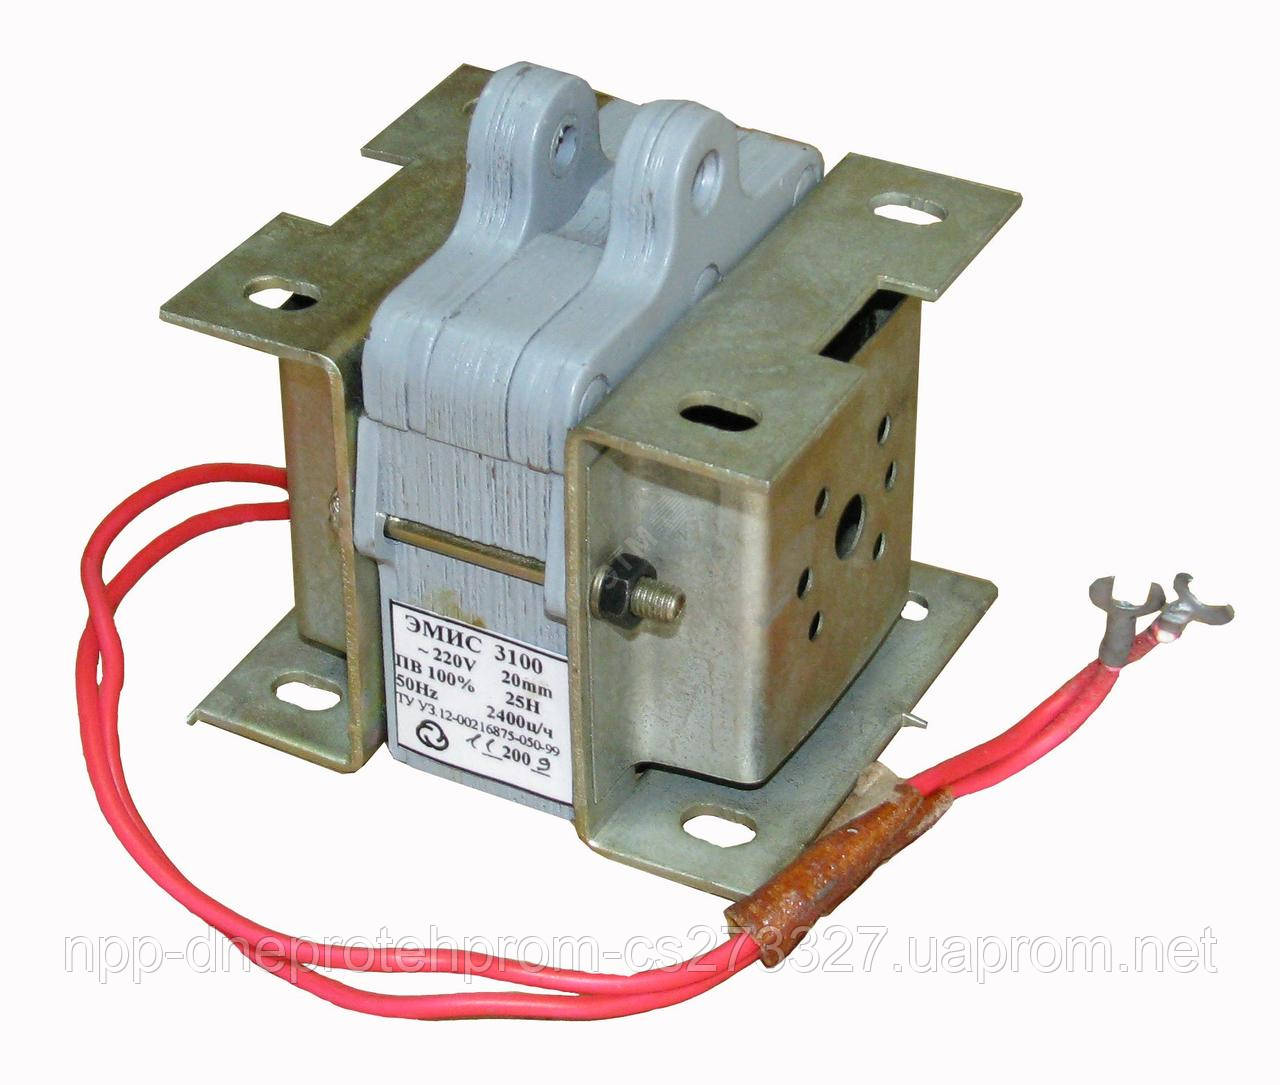 Электромагнит ЭМИС-3100, ЭМИС-3200